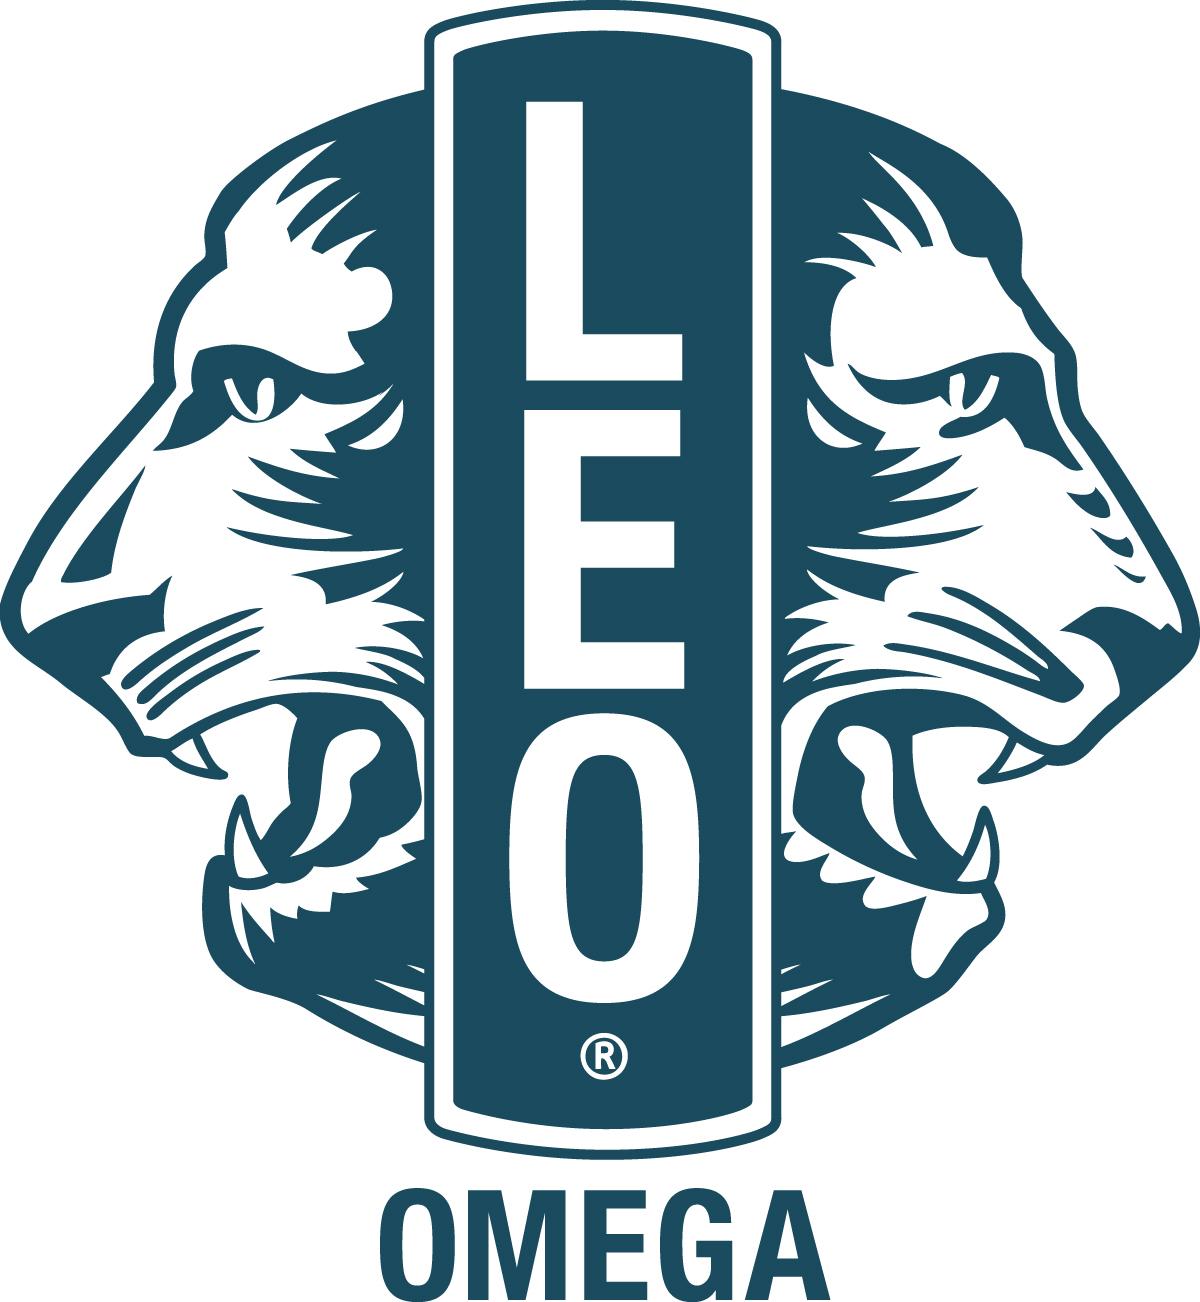 1200x1302 Lions Clubs International Logos